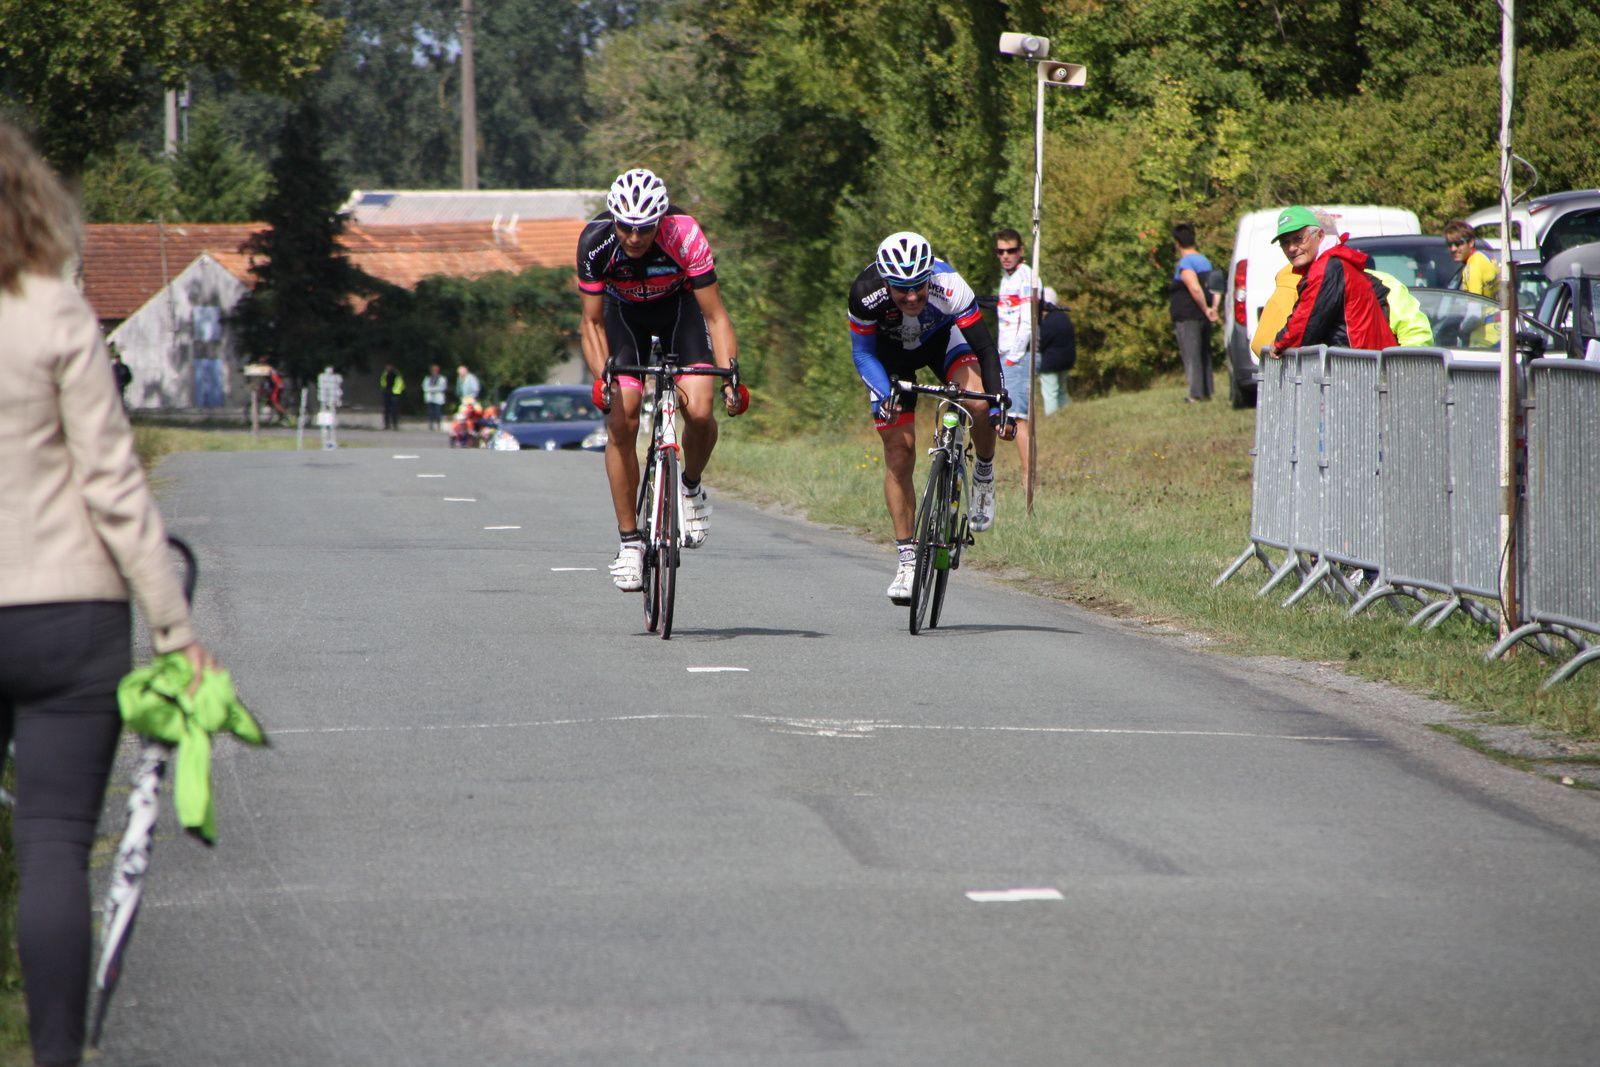 2e  Jean-Yves  MICHAUD(VC  Rochefort), 3e  Christophe  DAVIAUD(R  Guataise)